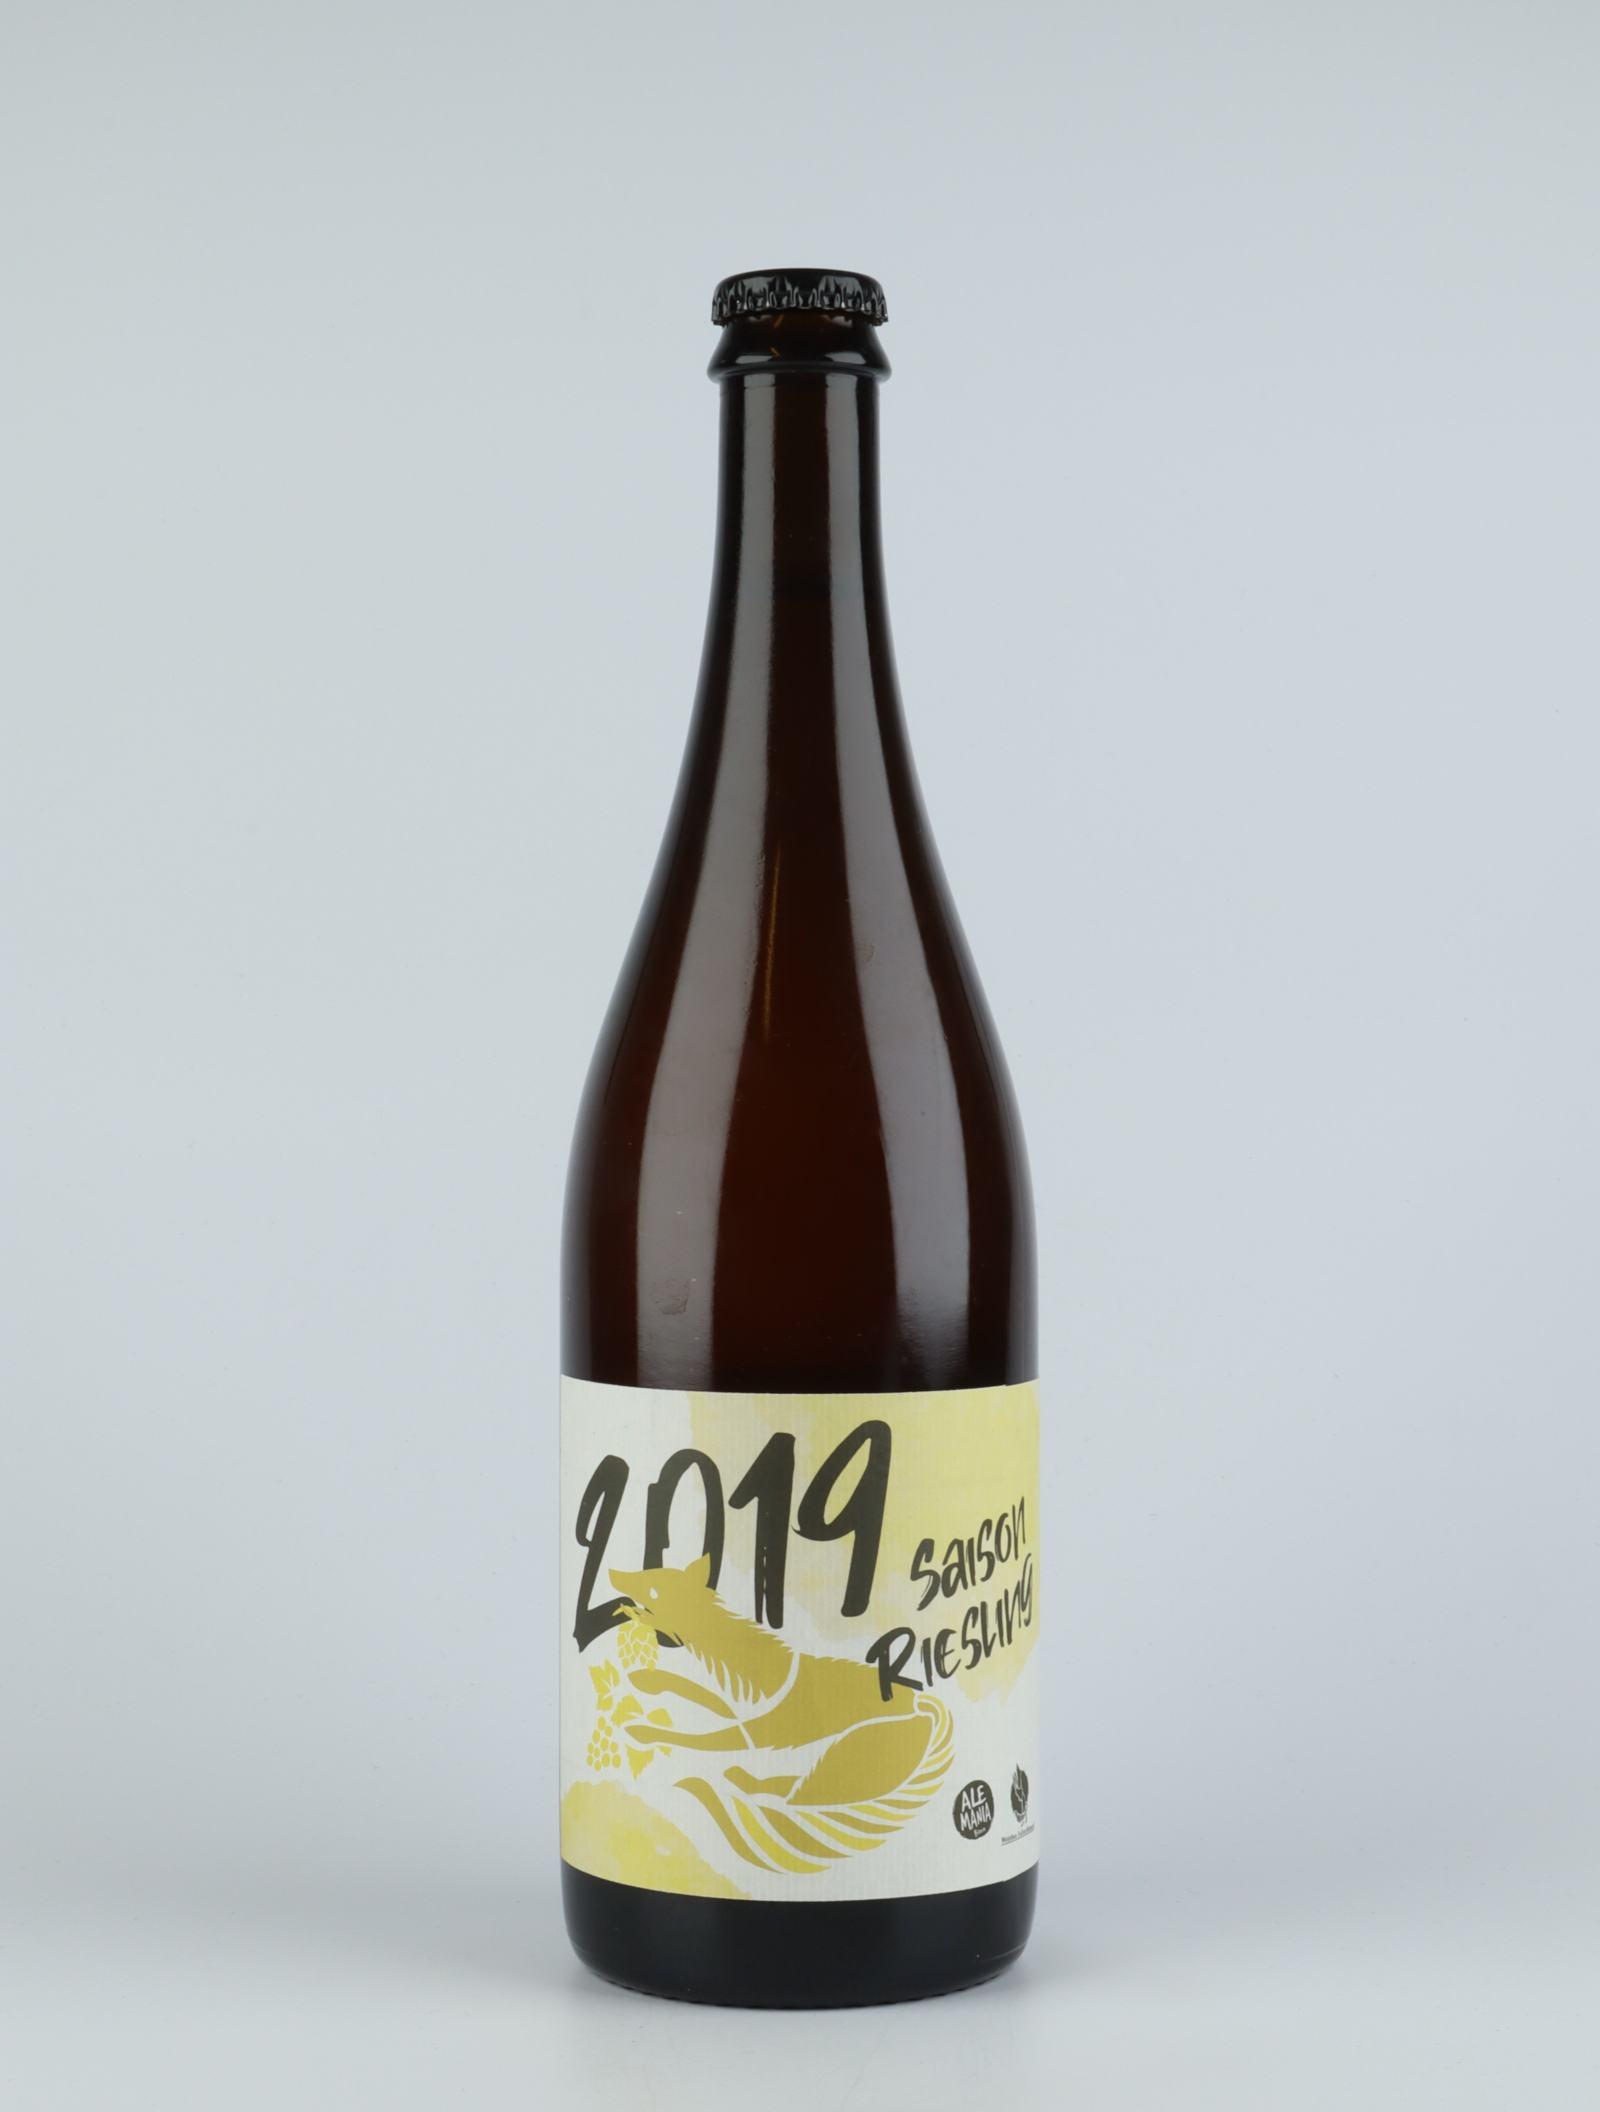 Saison Riesling Grape Ale